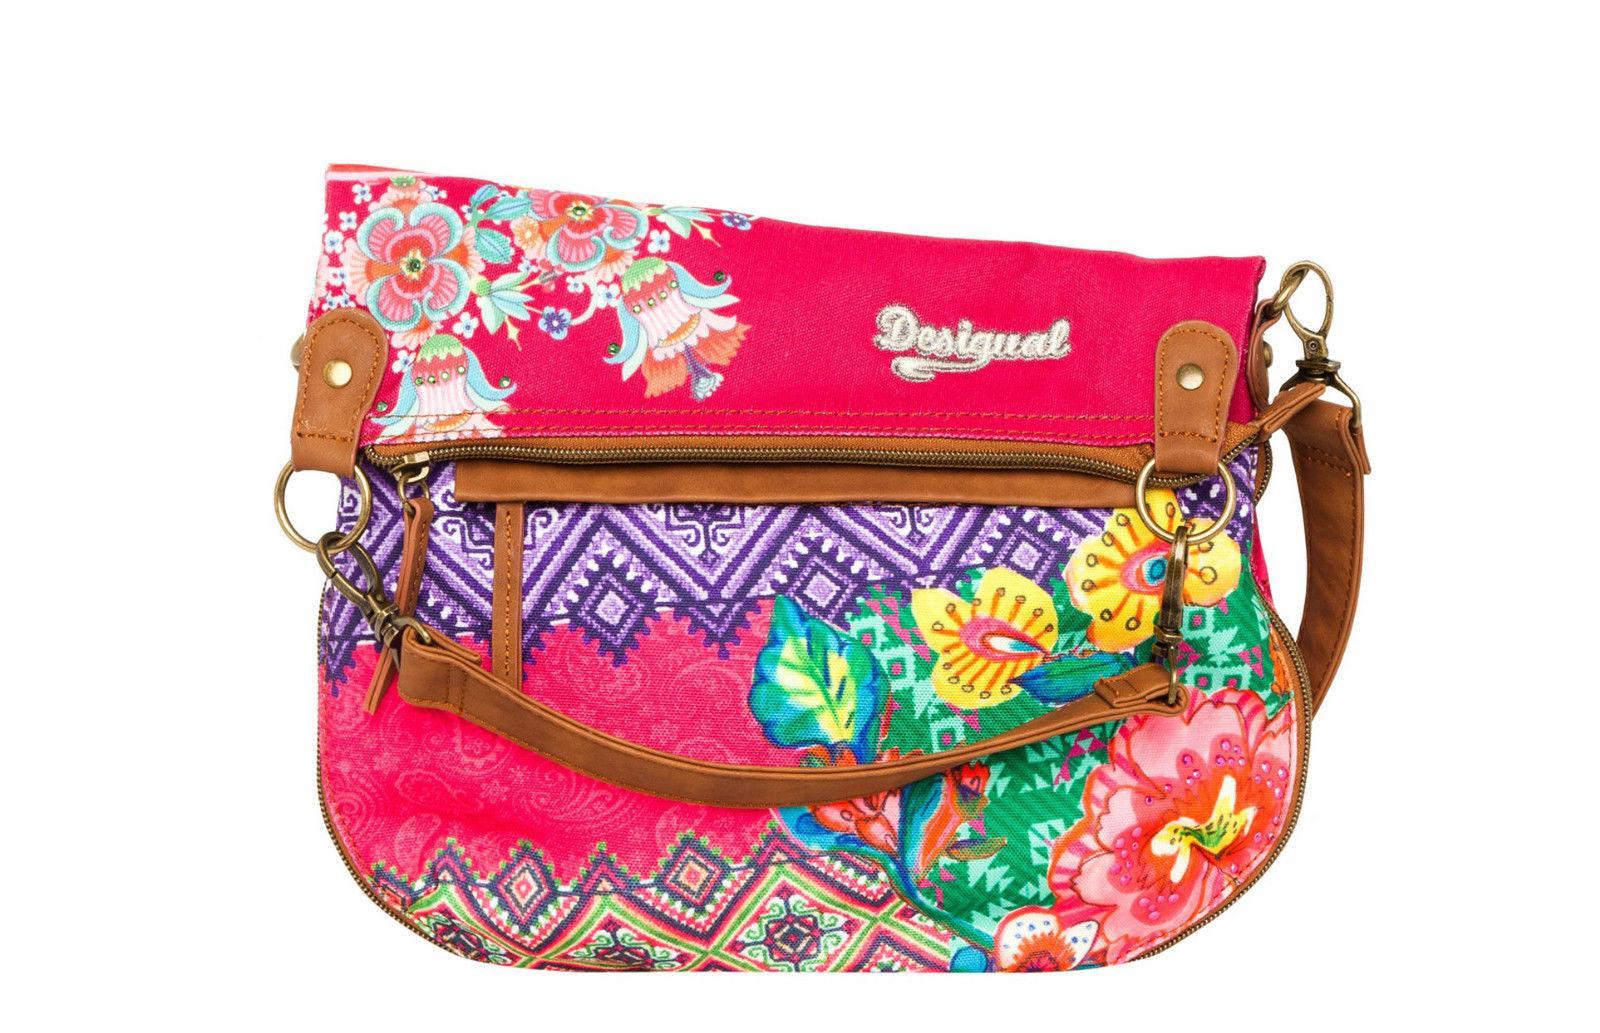 New Brand Handbag Shoulder Womens Desigual Fashion Bag Messenger rqtB8rOw